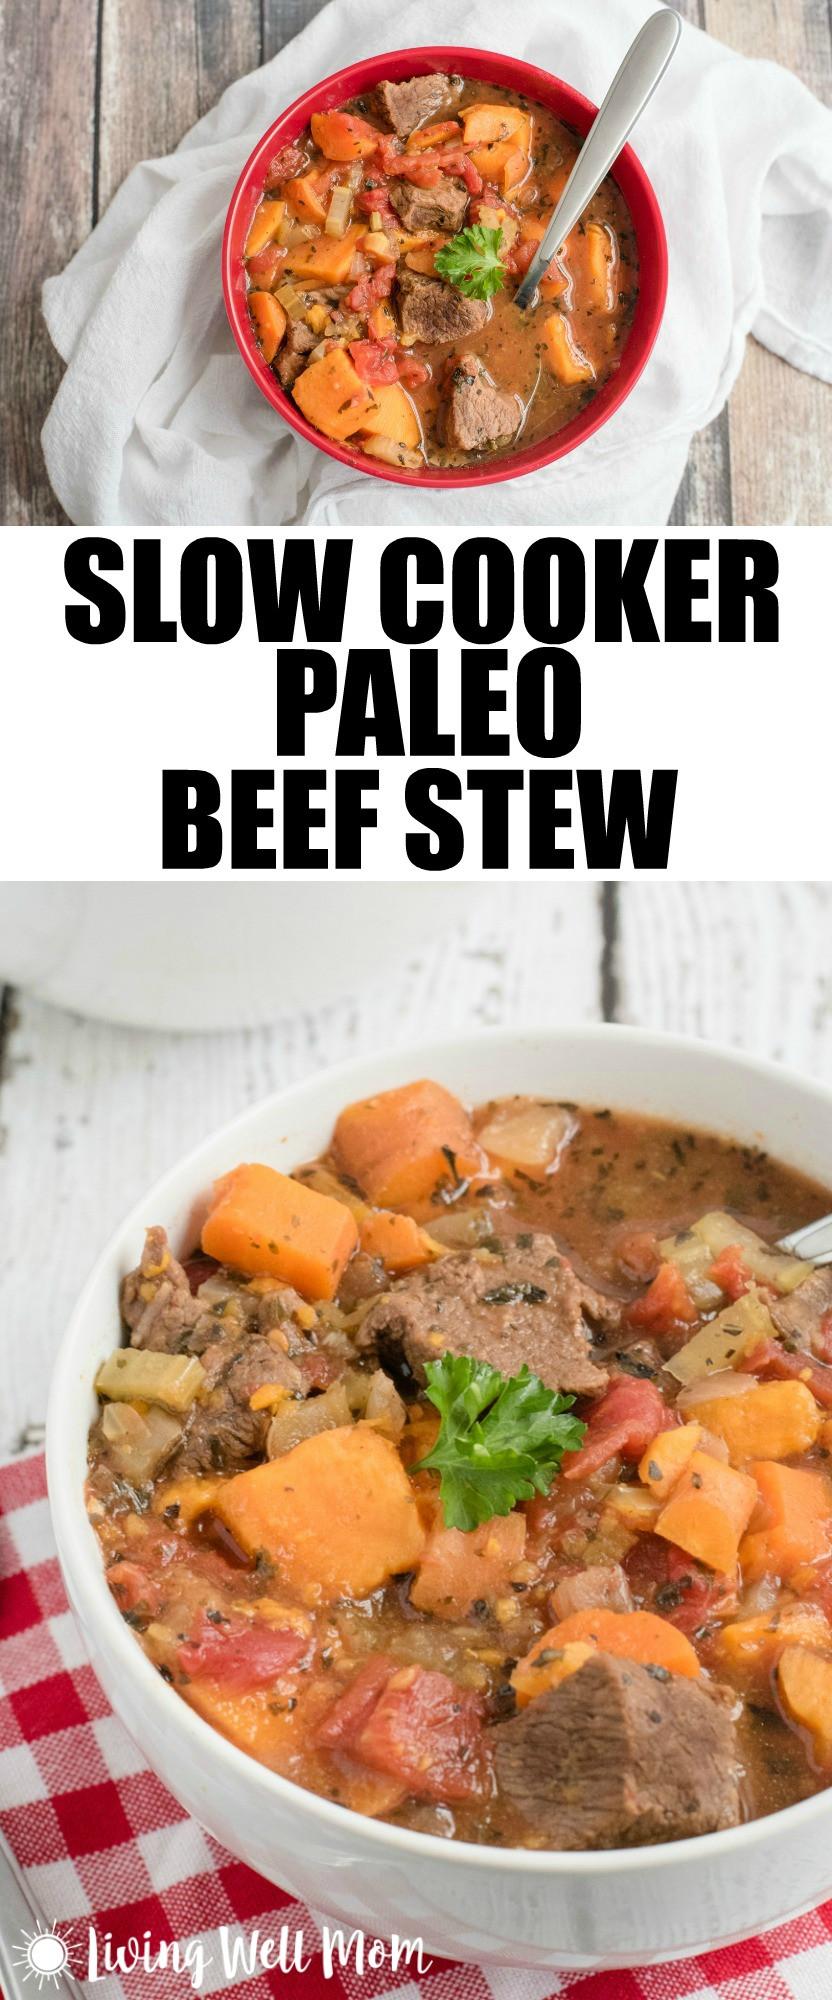 Healthy Beef Stew Recipe Slow Cooker  Slow Cooker Paleo Beef Stew Living Well Mom